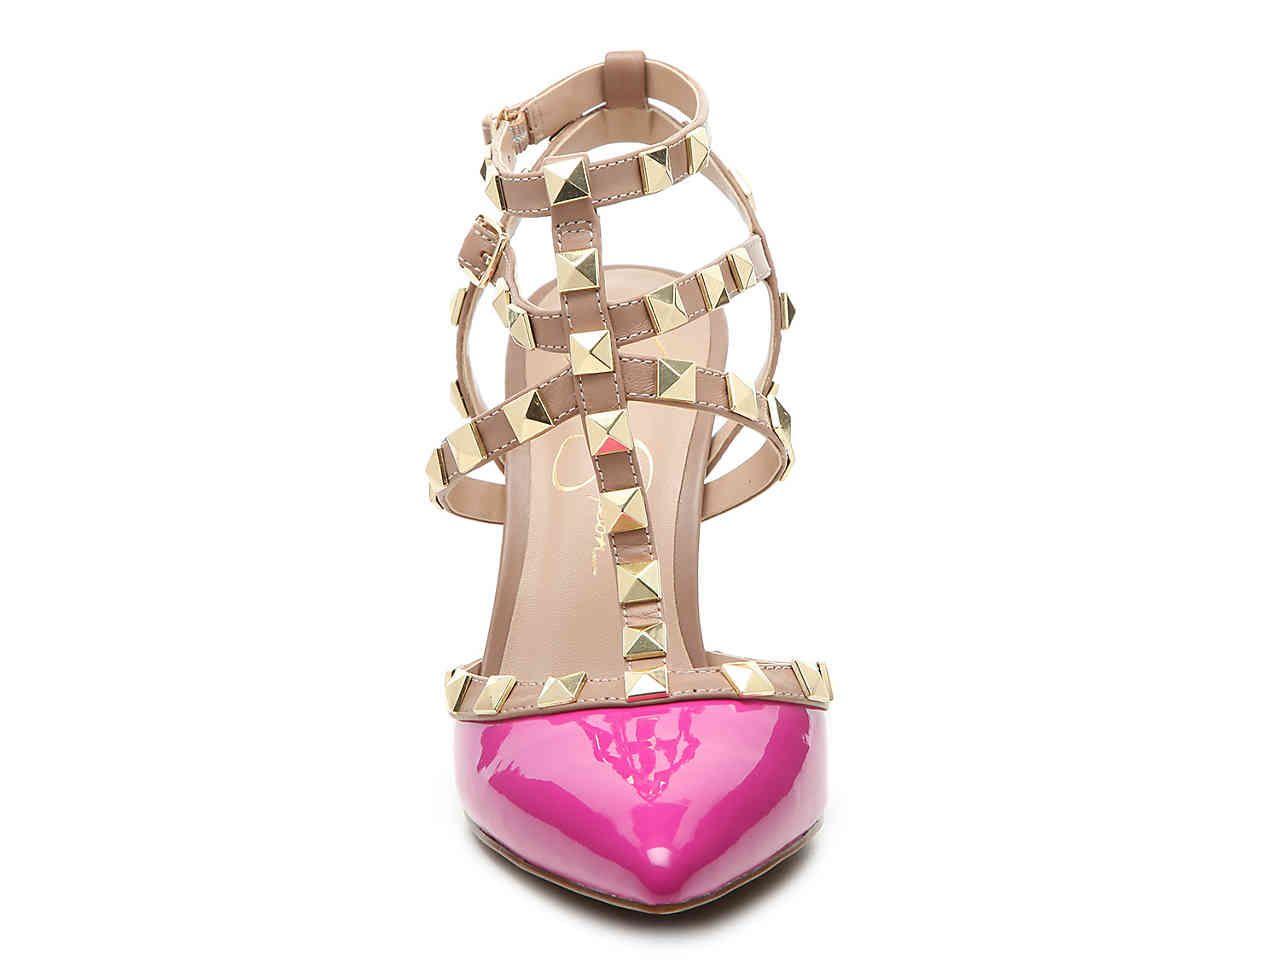 c4003e595a9 Jessica Simpson Dameera Pump Women s Shoes